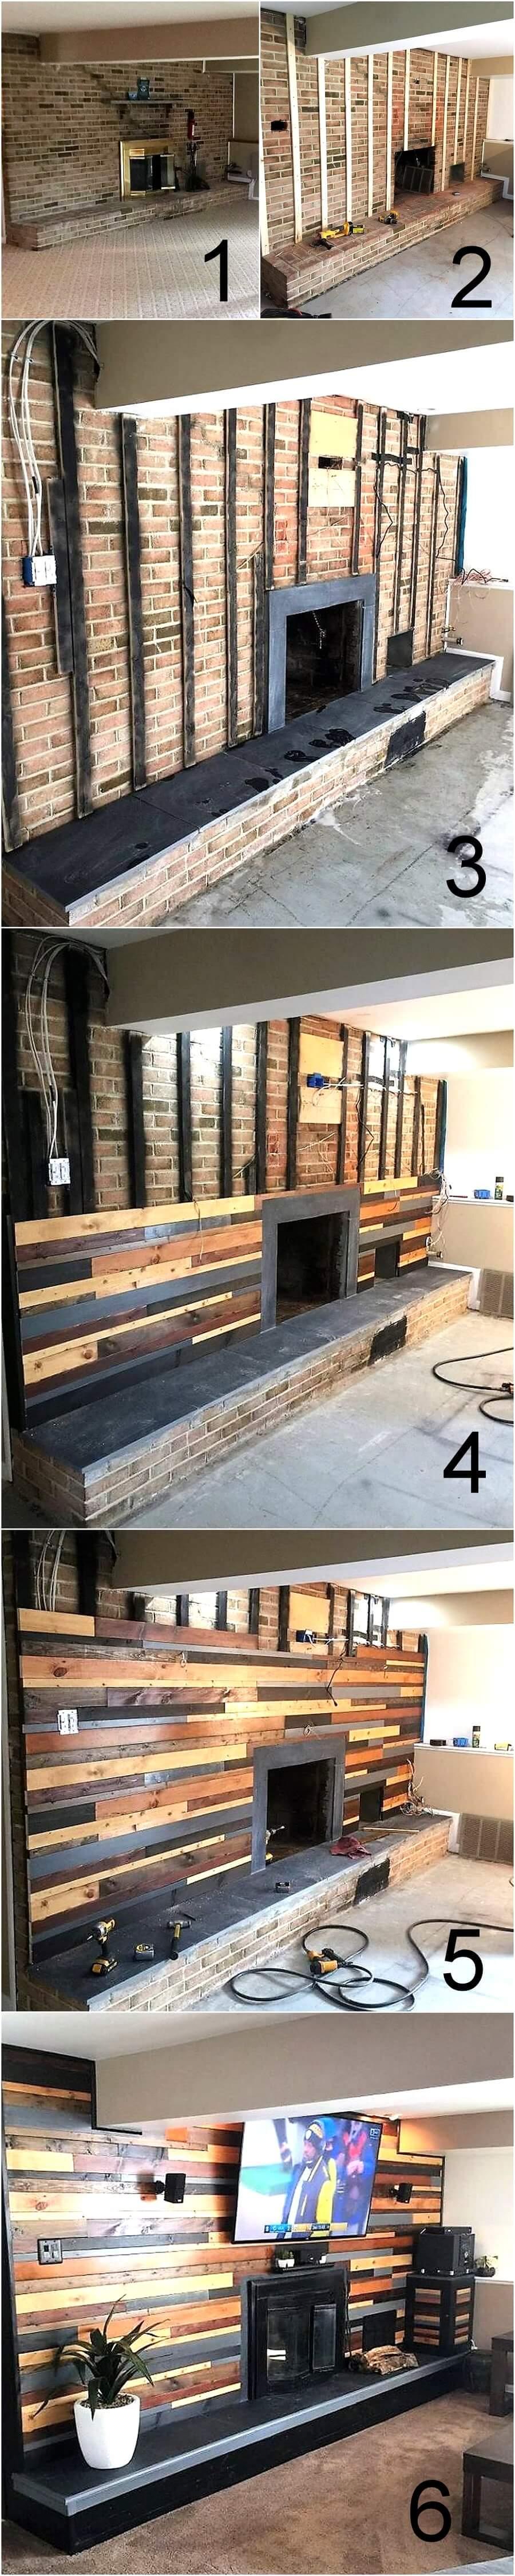 Diy Wooden Pallets Wall Cladding Plan Pallet Ideas